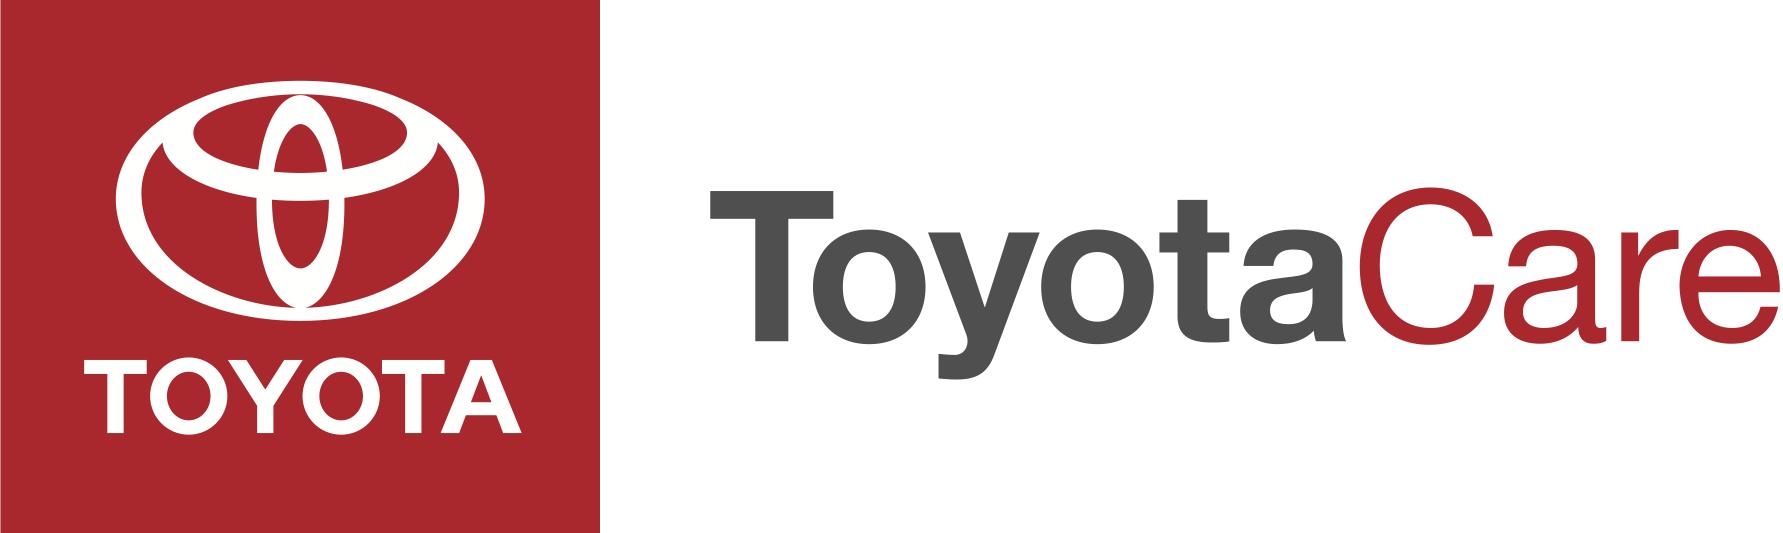 Toyotacare horz notag 4c